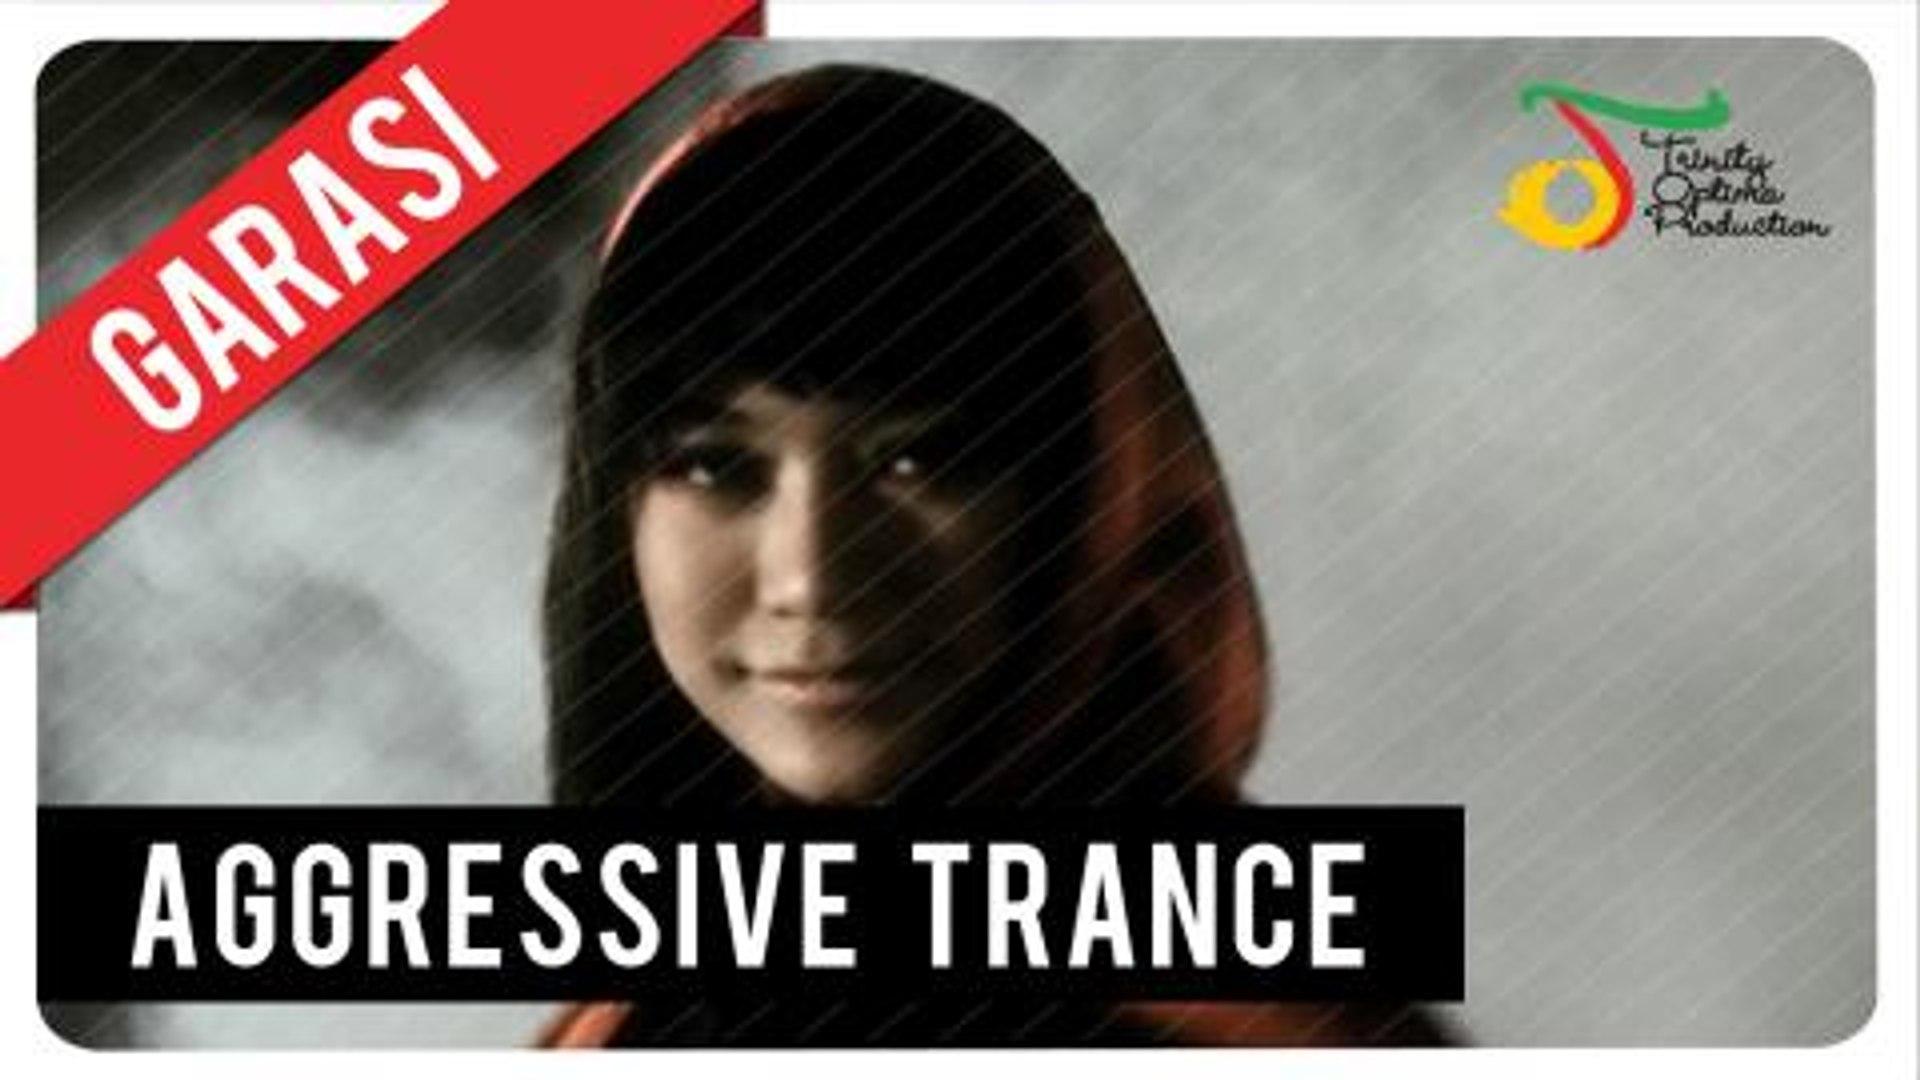 Aggresive Trance